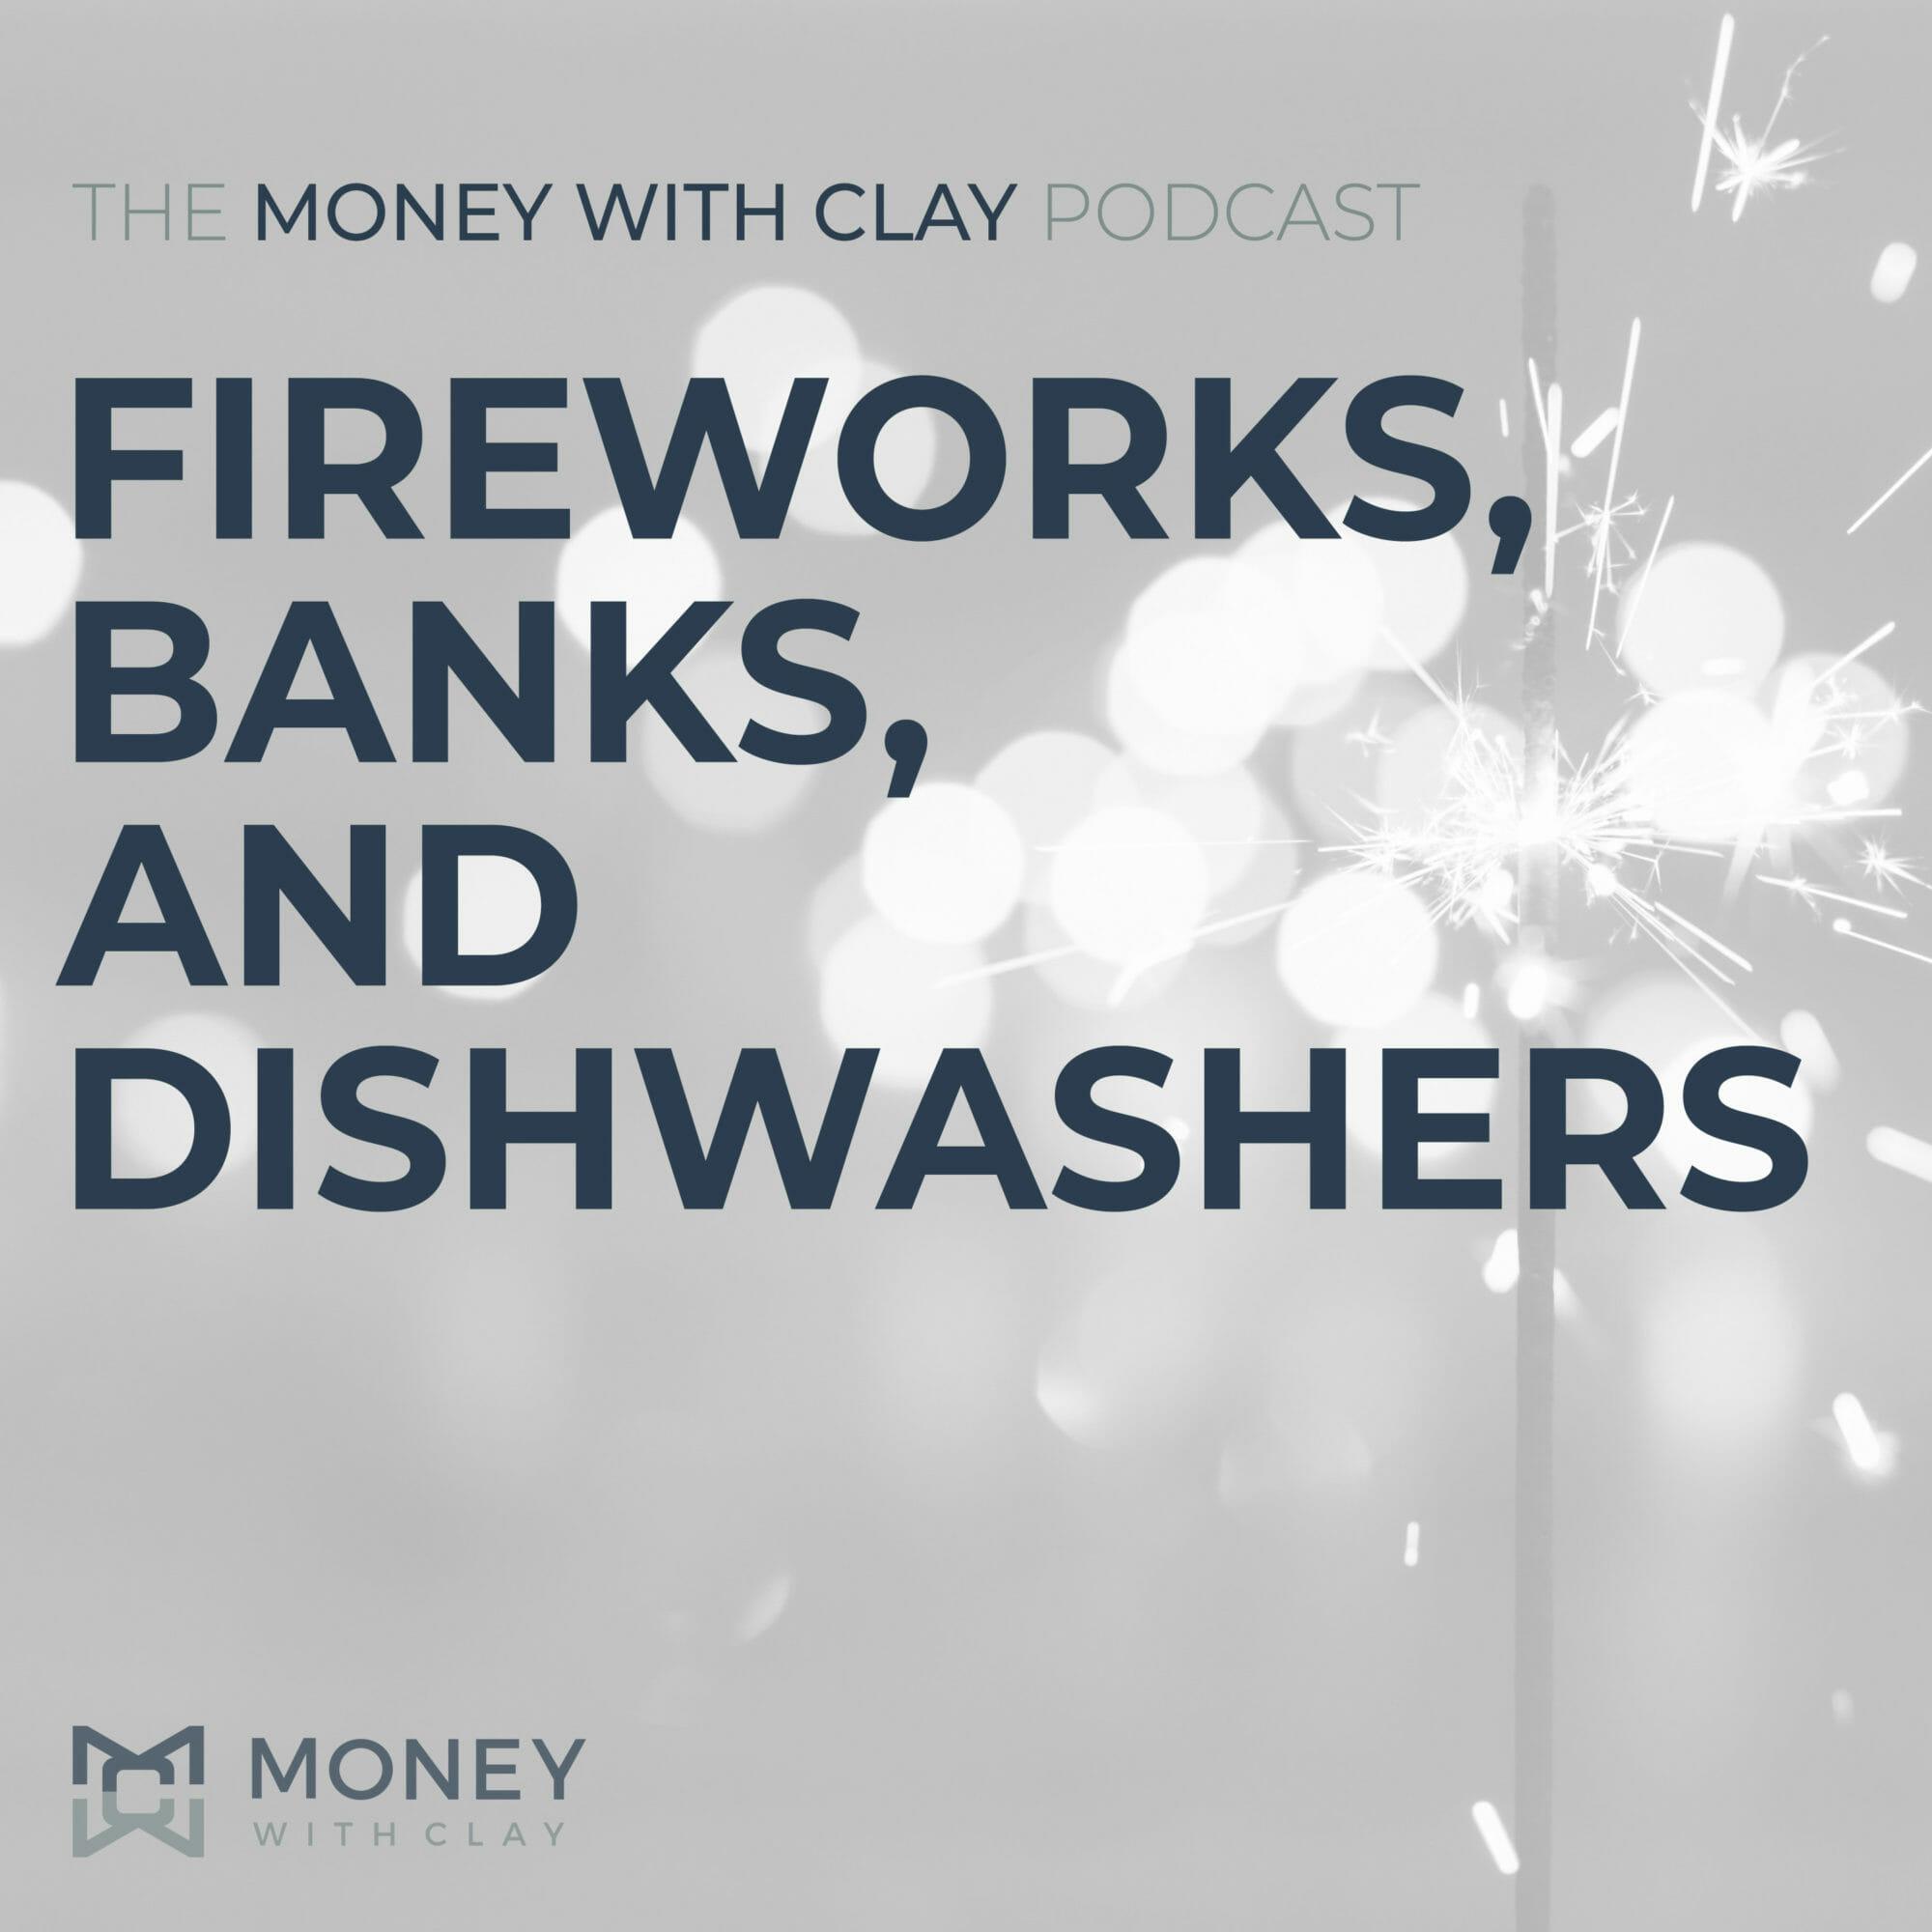 Fireworks, Banks, and Dishwashers